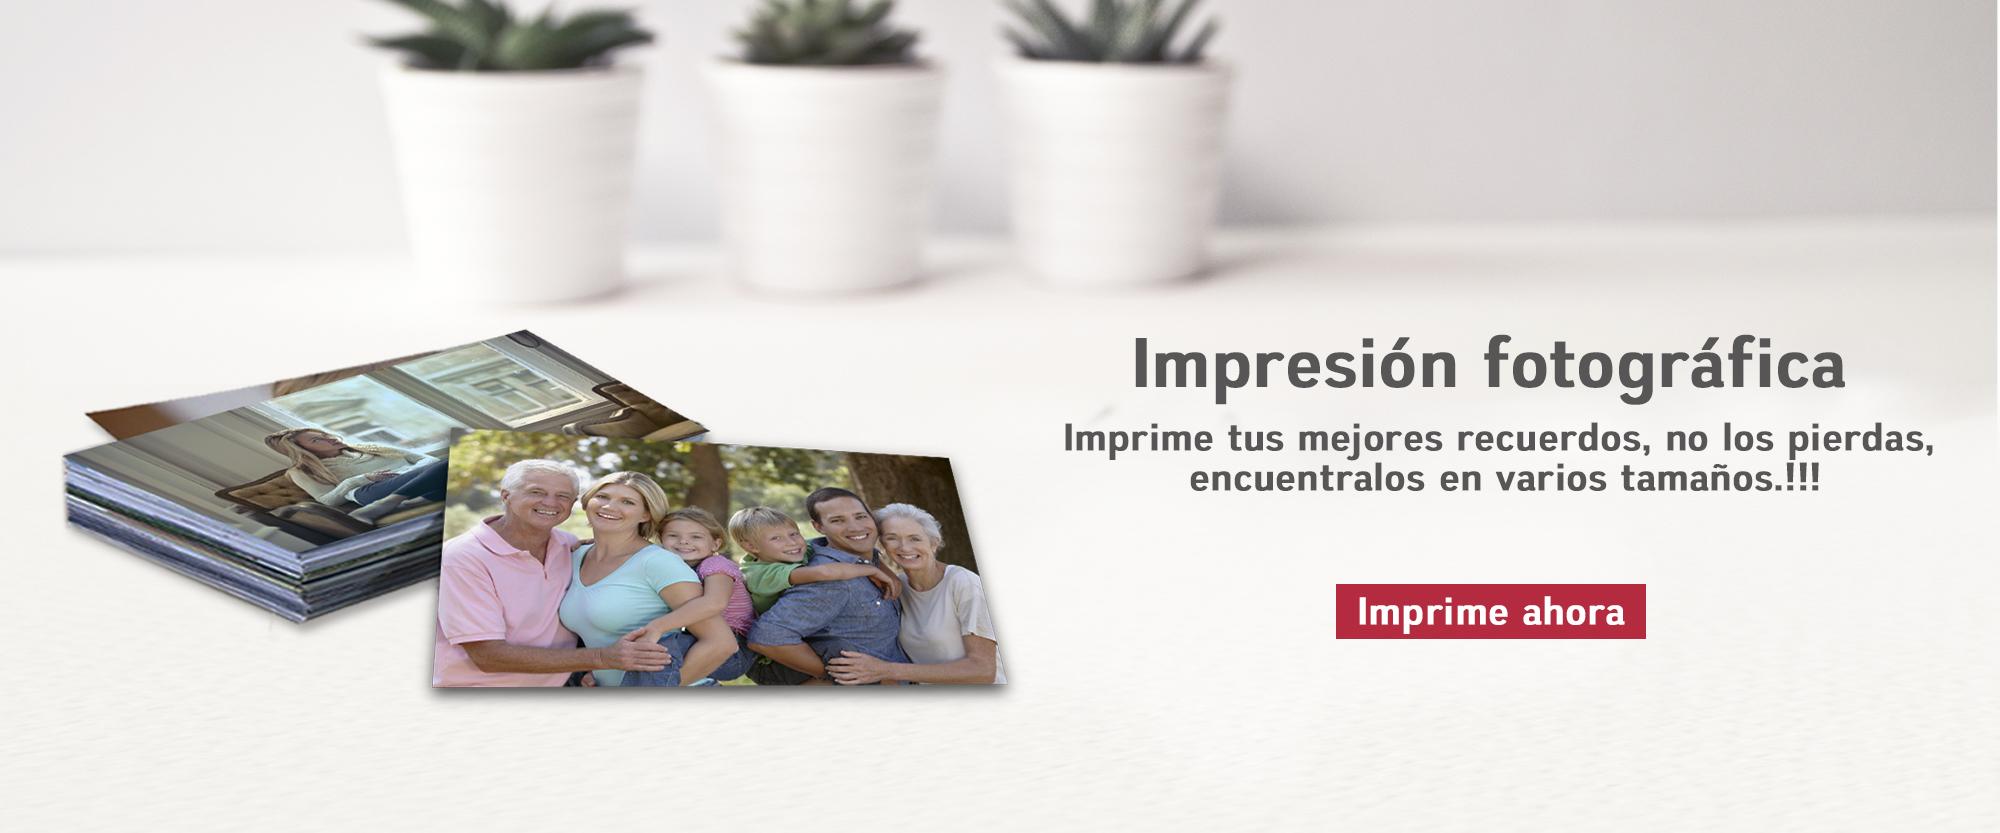 banner-impresion-fotos